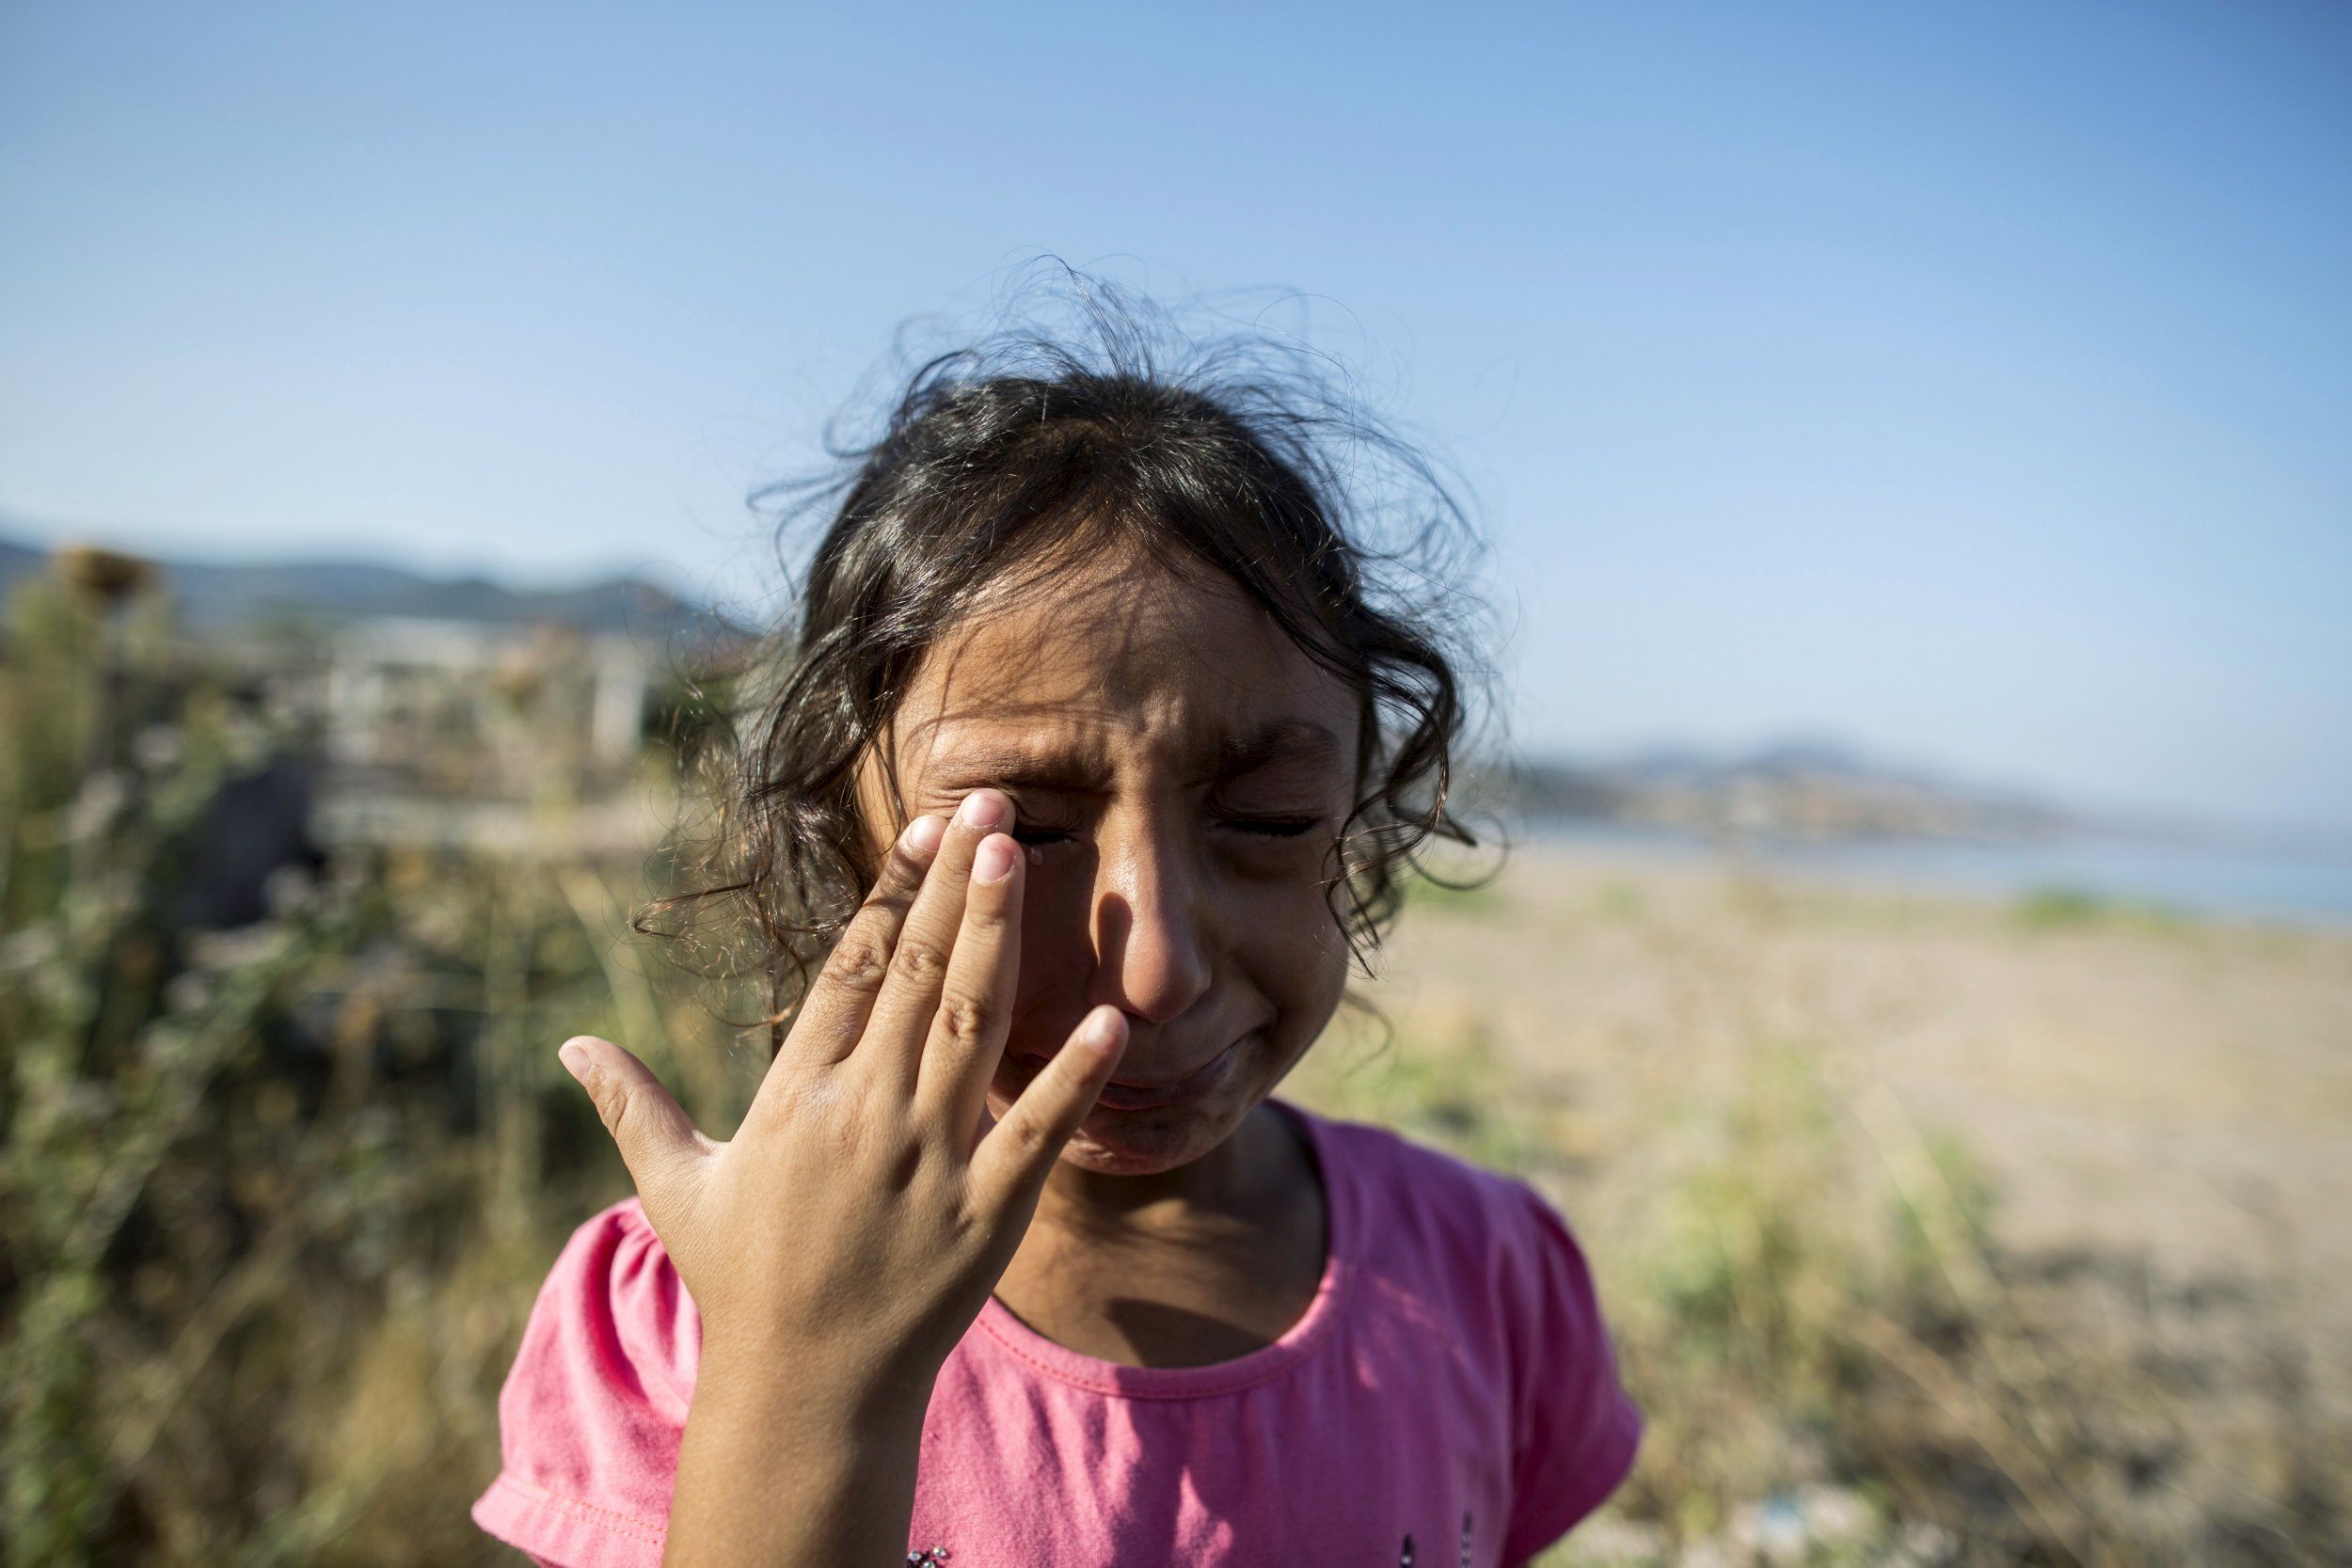 Syrian migrant Yasmine